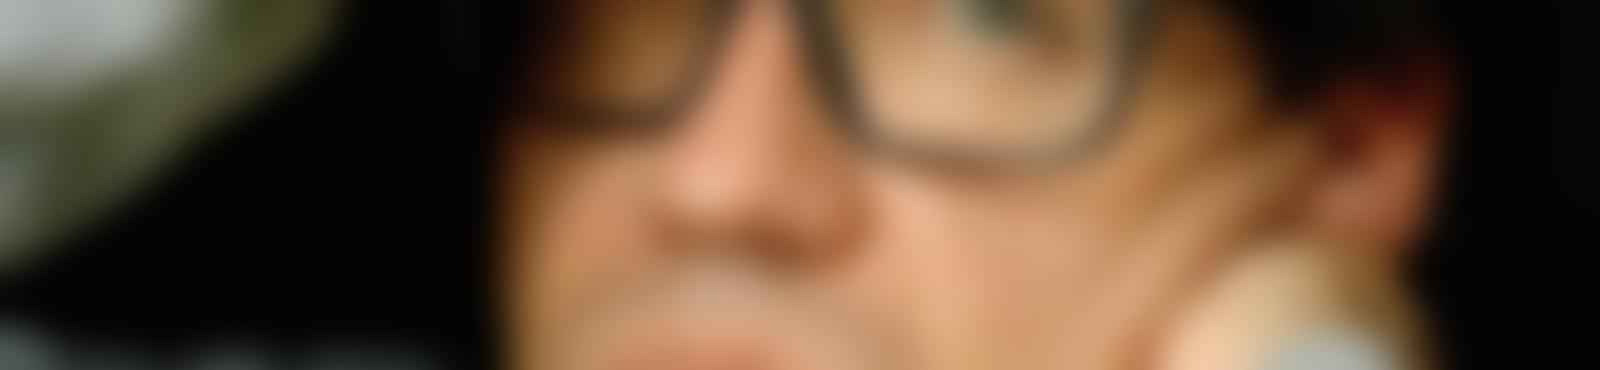 Blurred 0495a5e2 25b6 4c14 b66e 1db51b86421a